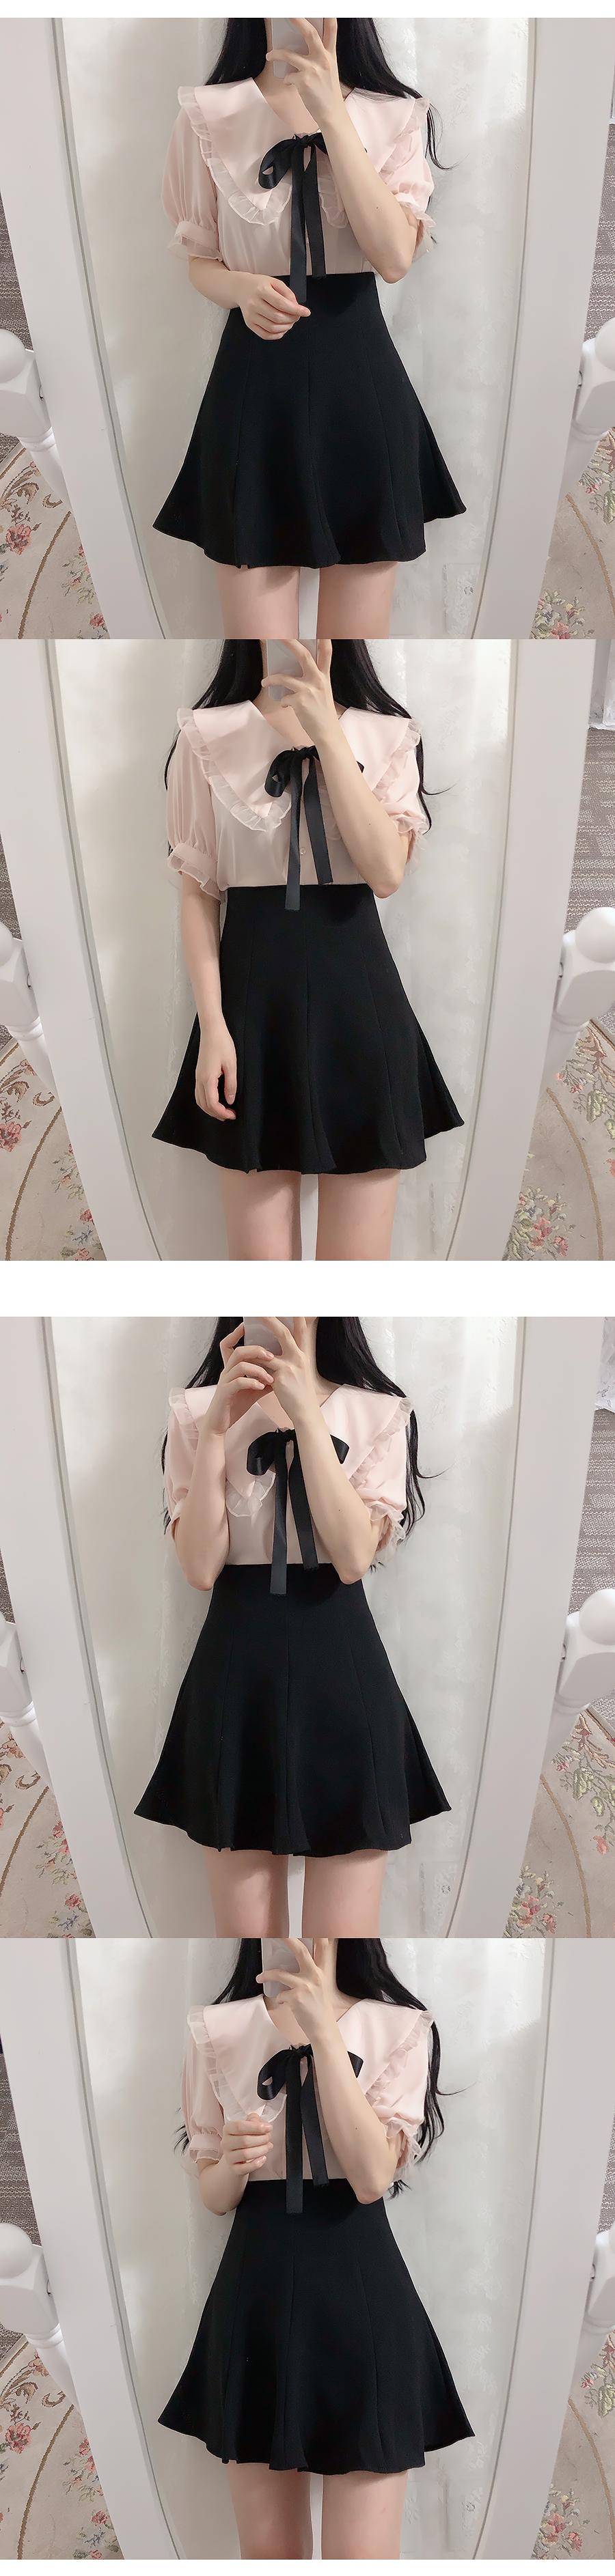 Daily Flare Skirt